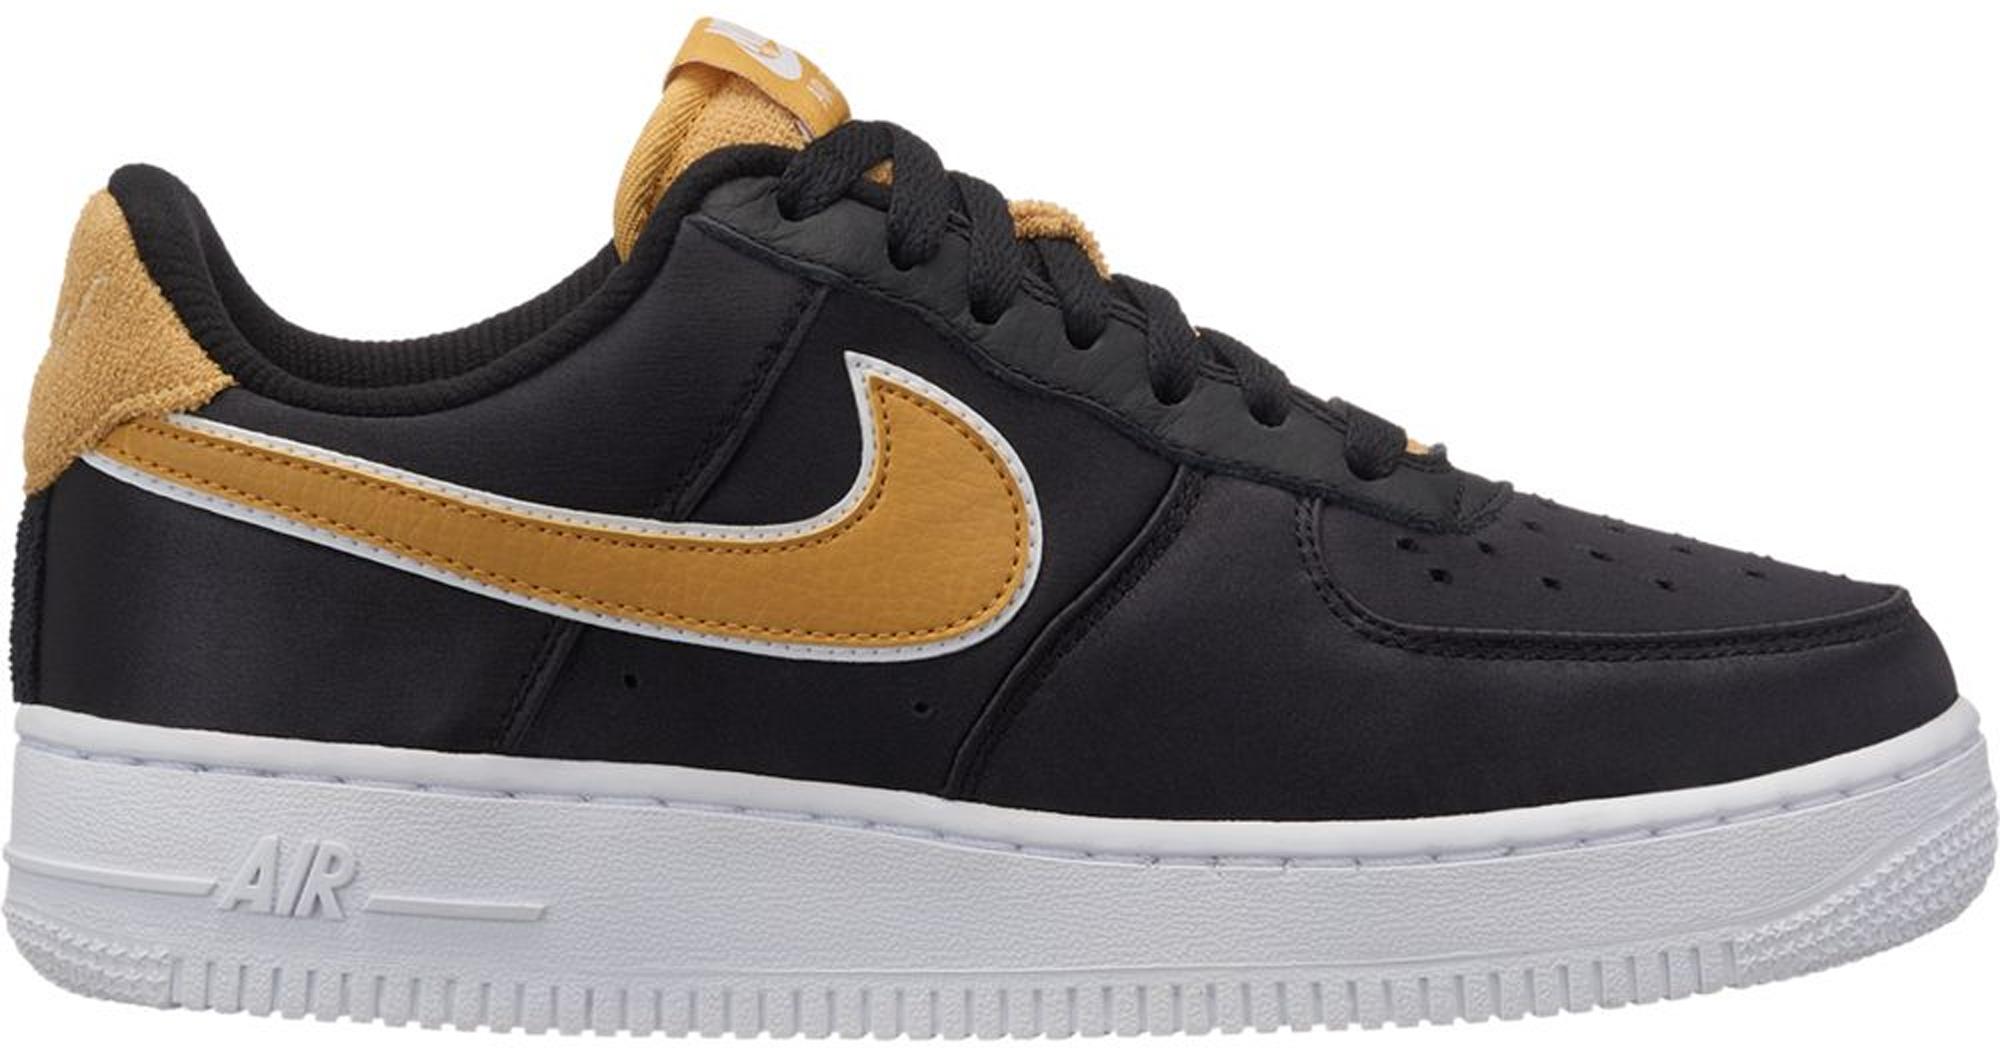 Nike Air Force 1 Low Satin Black Wheat